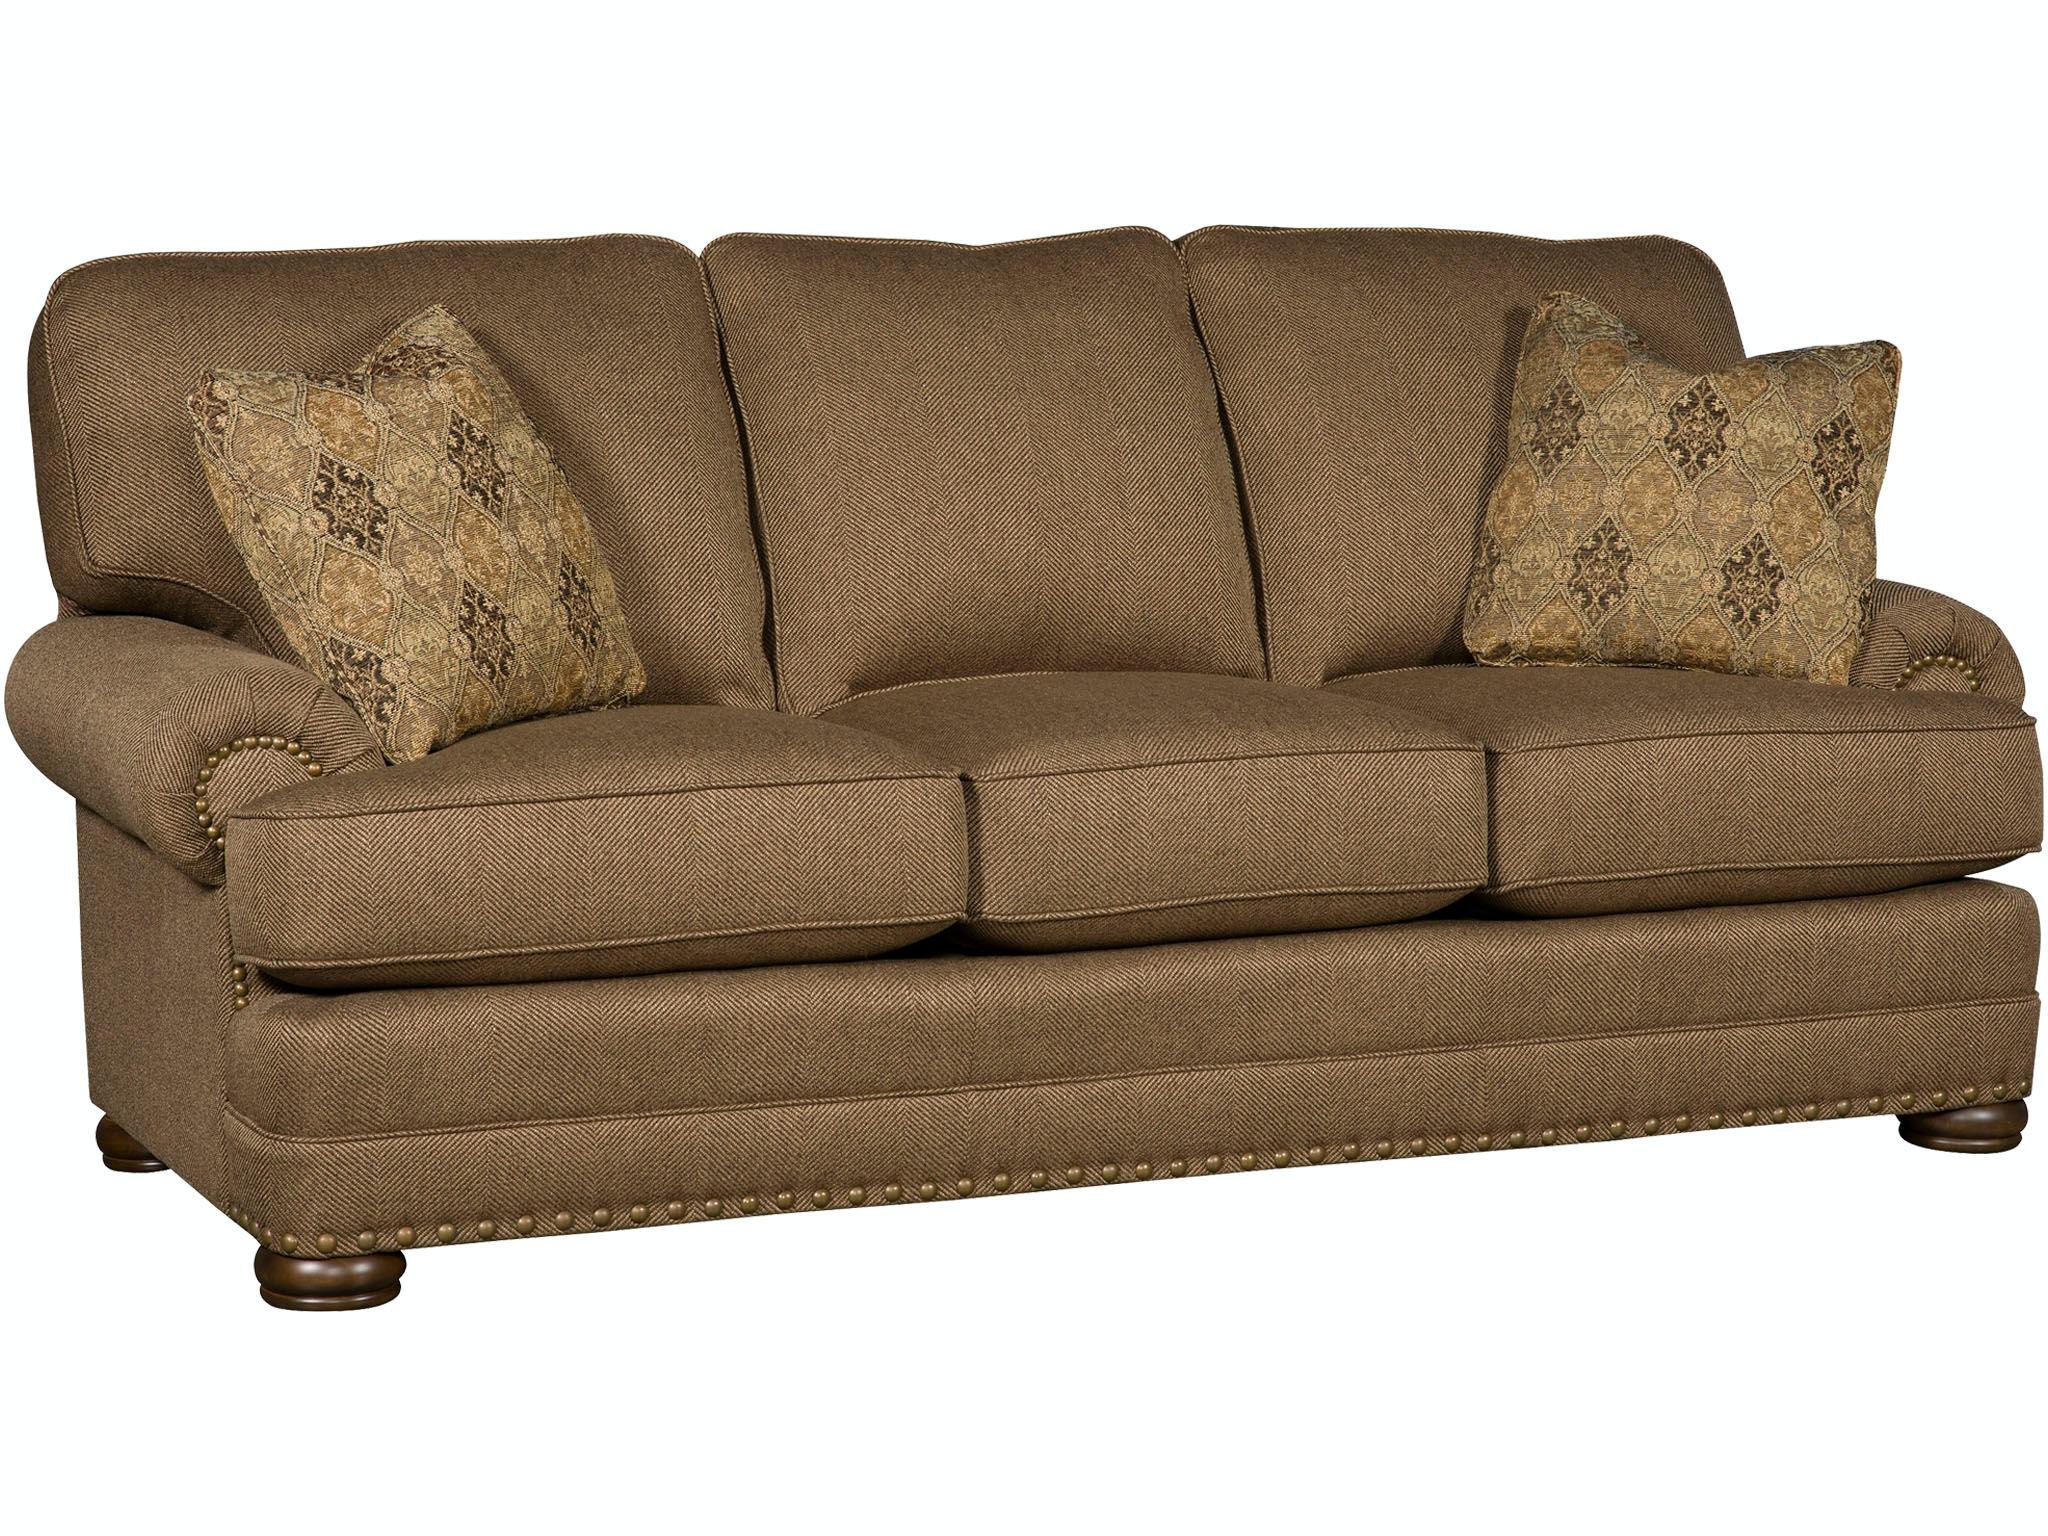 King Hickory Edward Fabric Sofa 8500